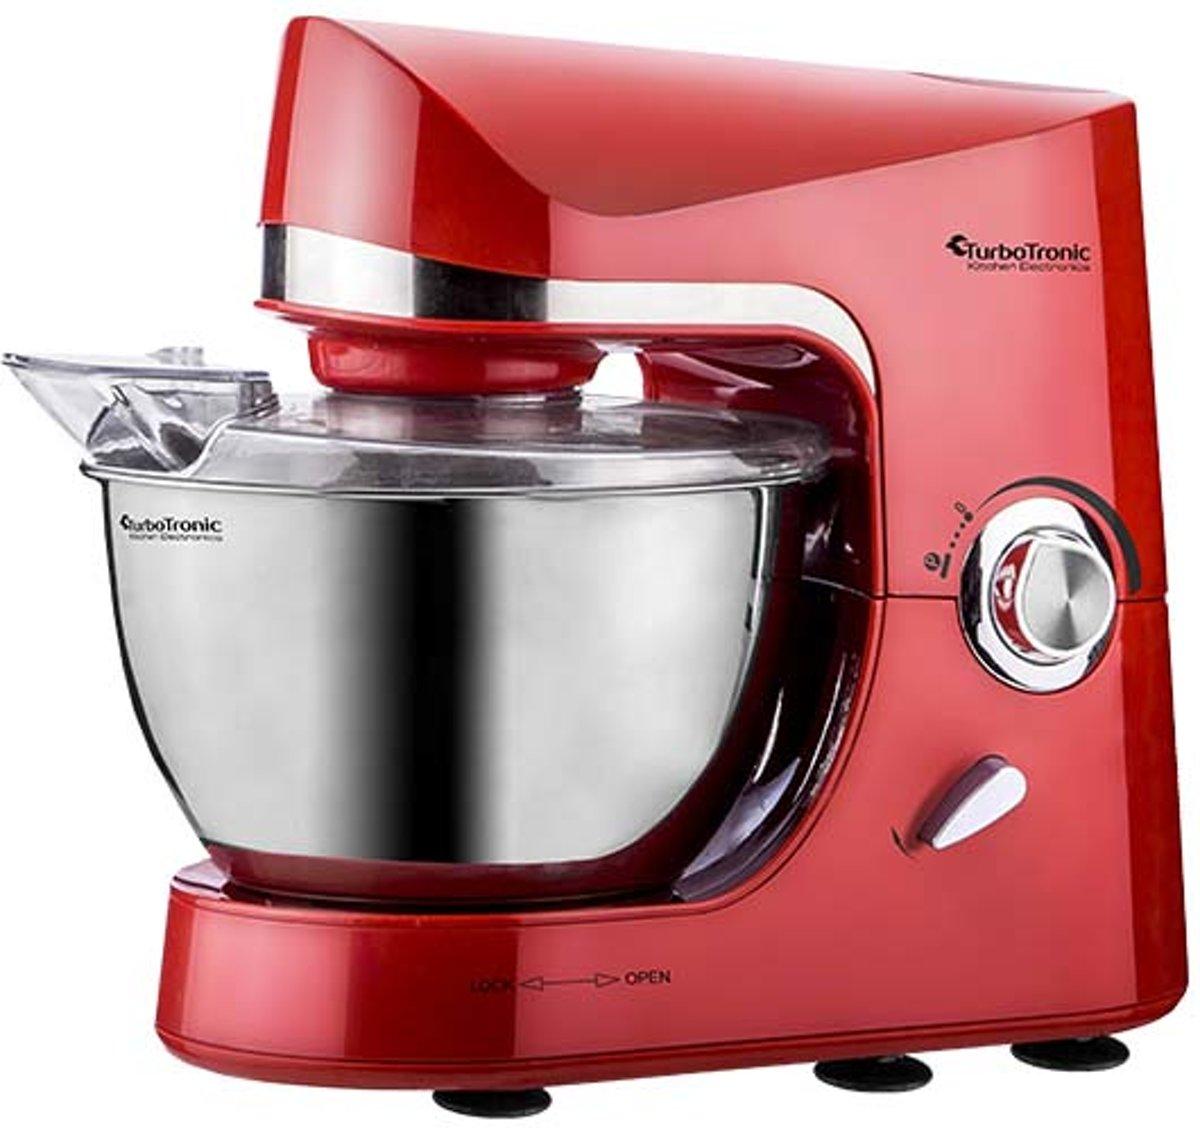 TurboTronic Pro-mix - Keukenmachine - Rood kopen